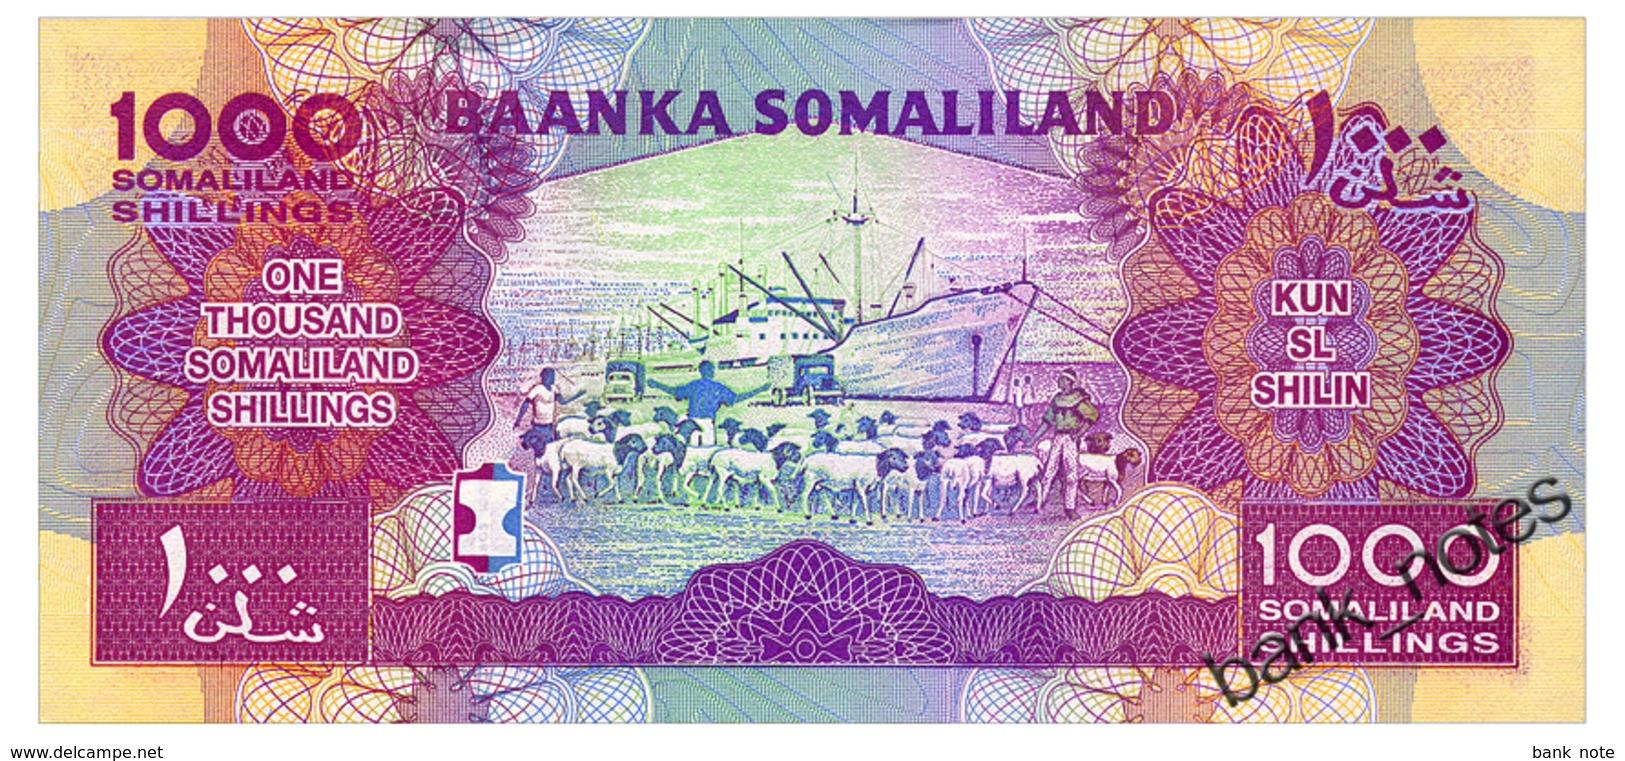 SOMALILAND 1000 SHILLINGS 2015 Pick 20 Unc - Somalia